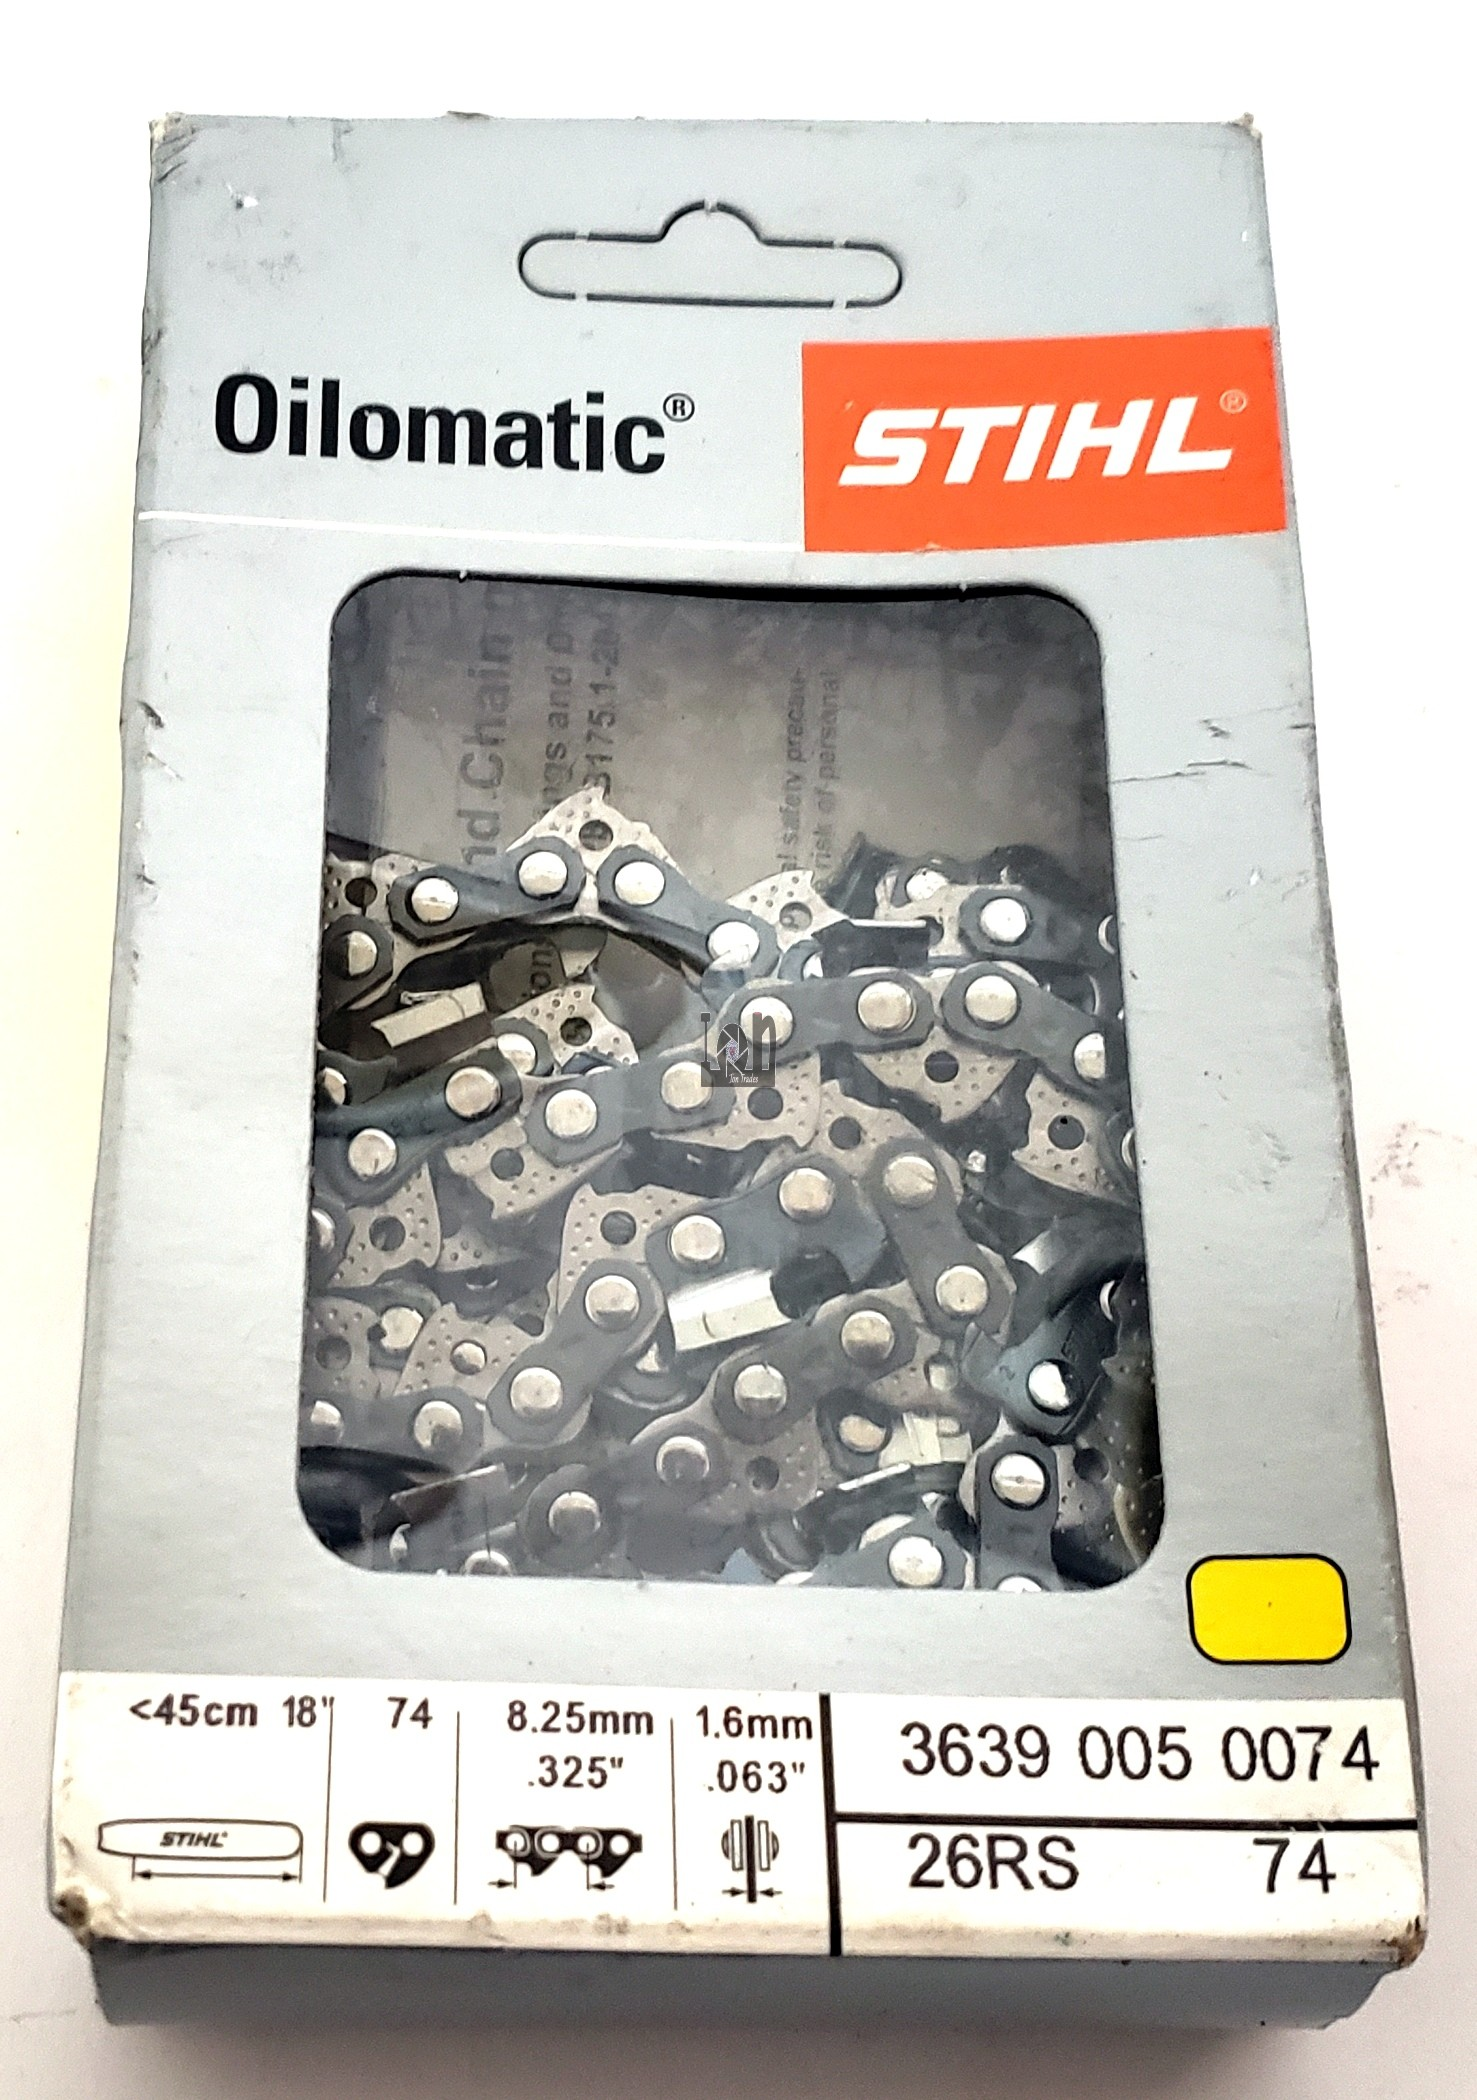 "Stihl 26RS 74 18"" Chainsaw Chain Oilomatic 74 .325 .063"